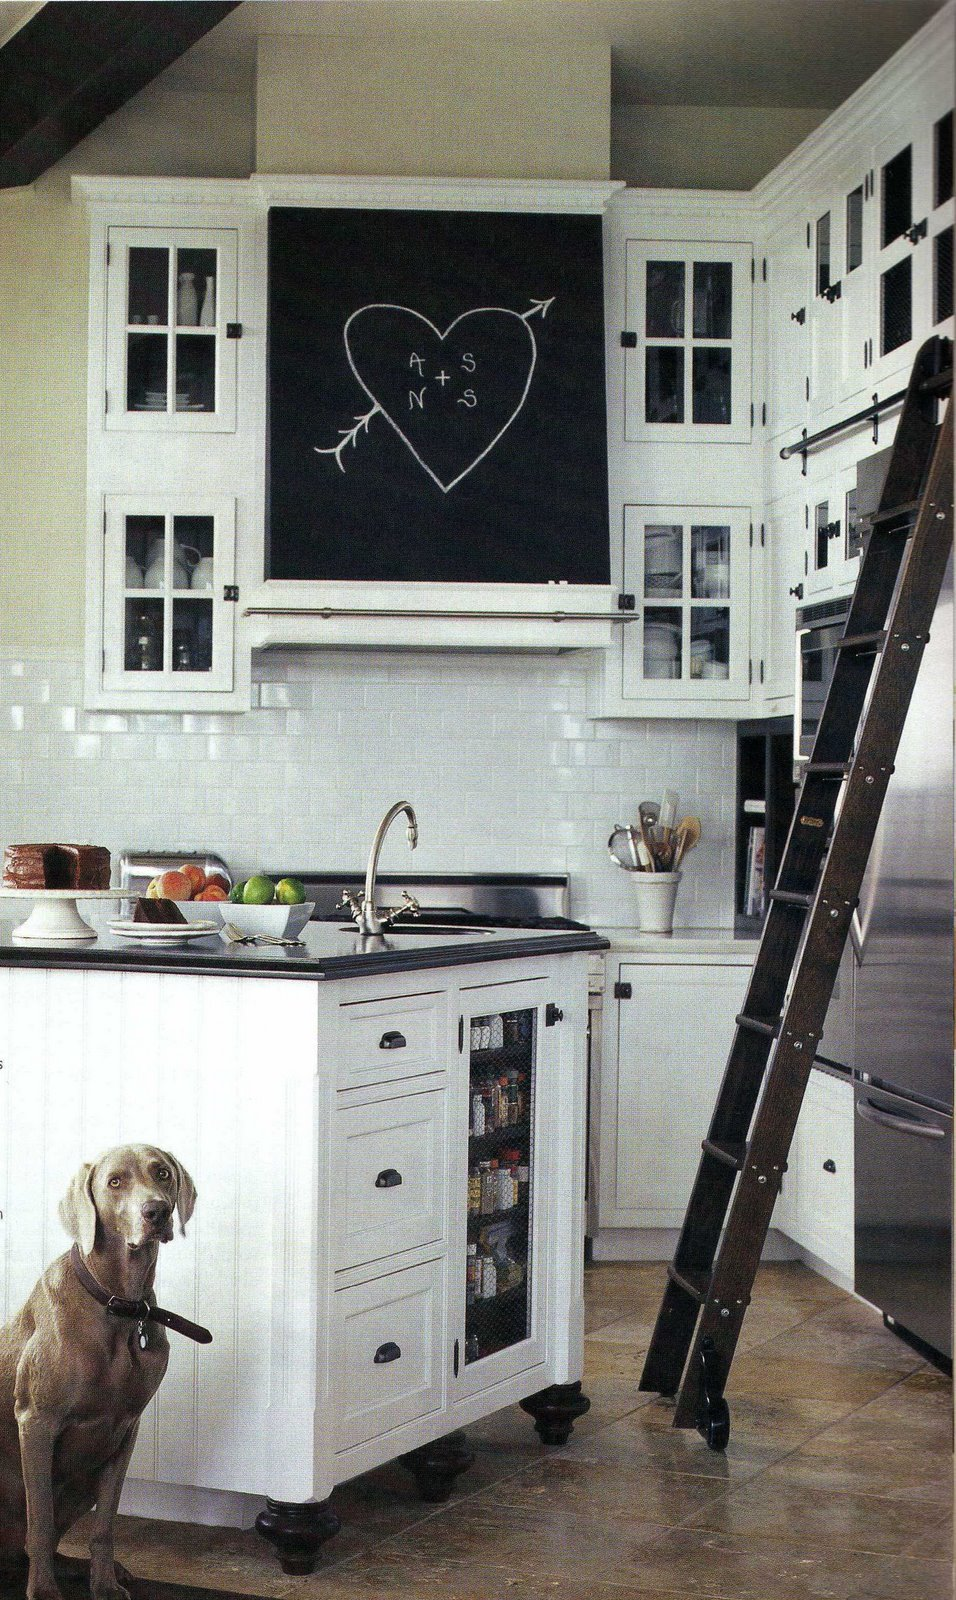 4bildcasa vernici lavagna - Lavagna per cucina ...